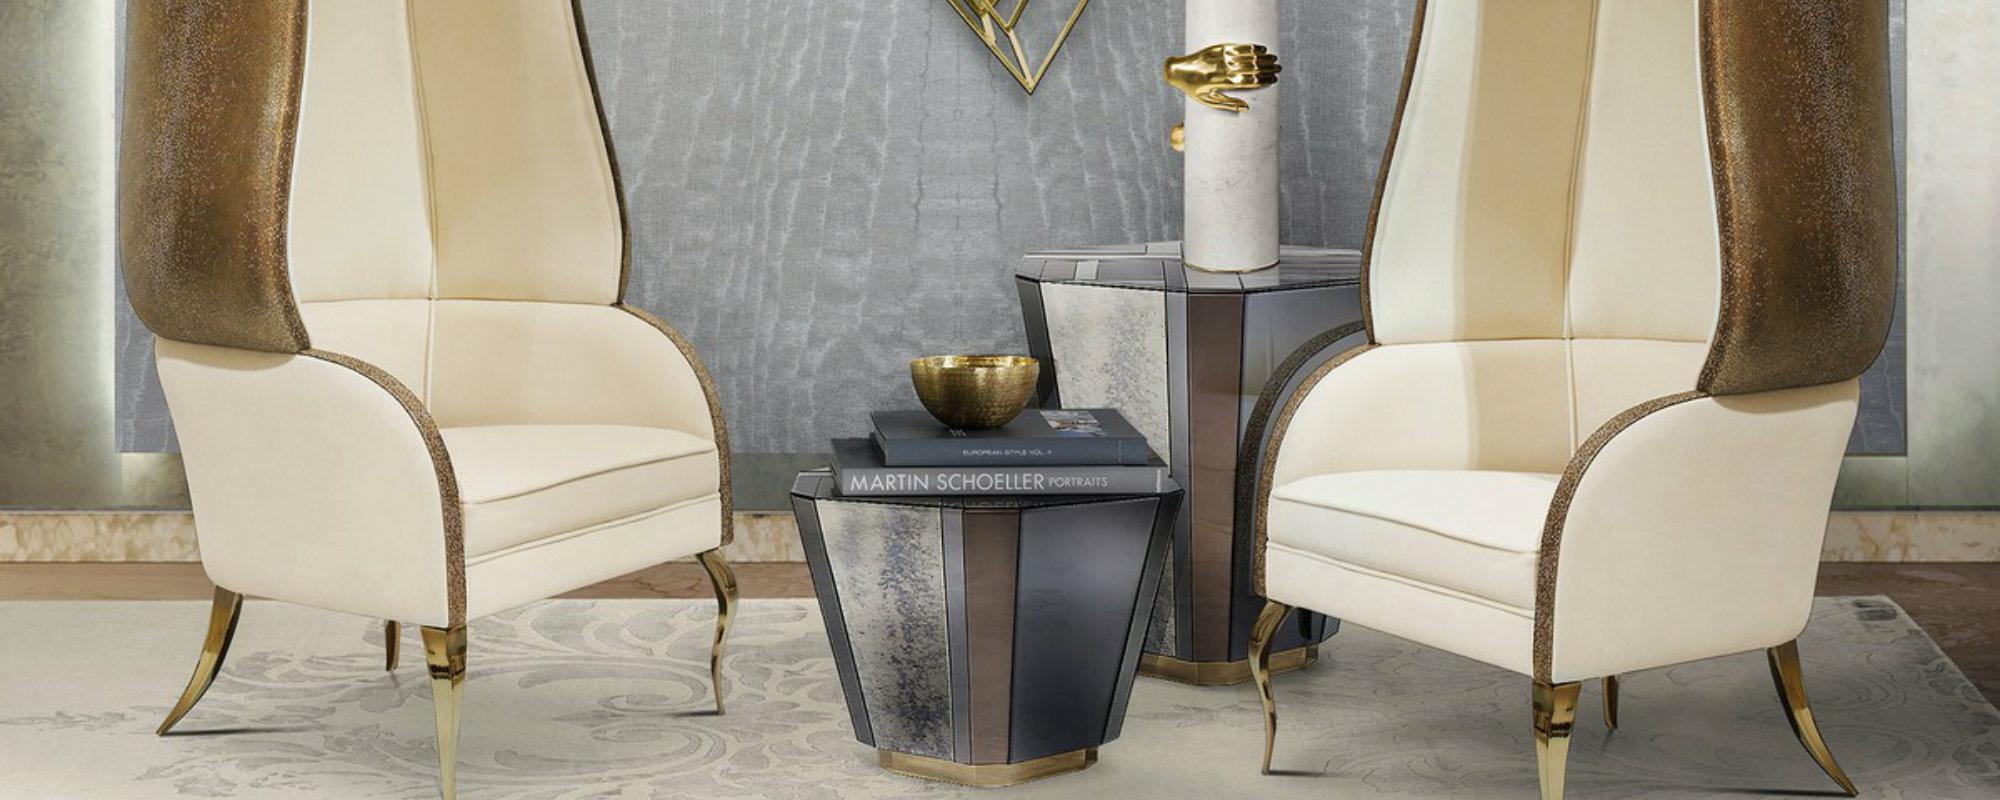 Ideas para Decorar: mesas de centro para decorar una sala de lujo ideas para decorar Ideas para Decorar: mesas de centro para decorar una sala de lujo Featured 2